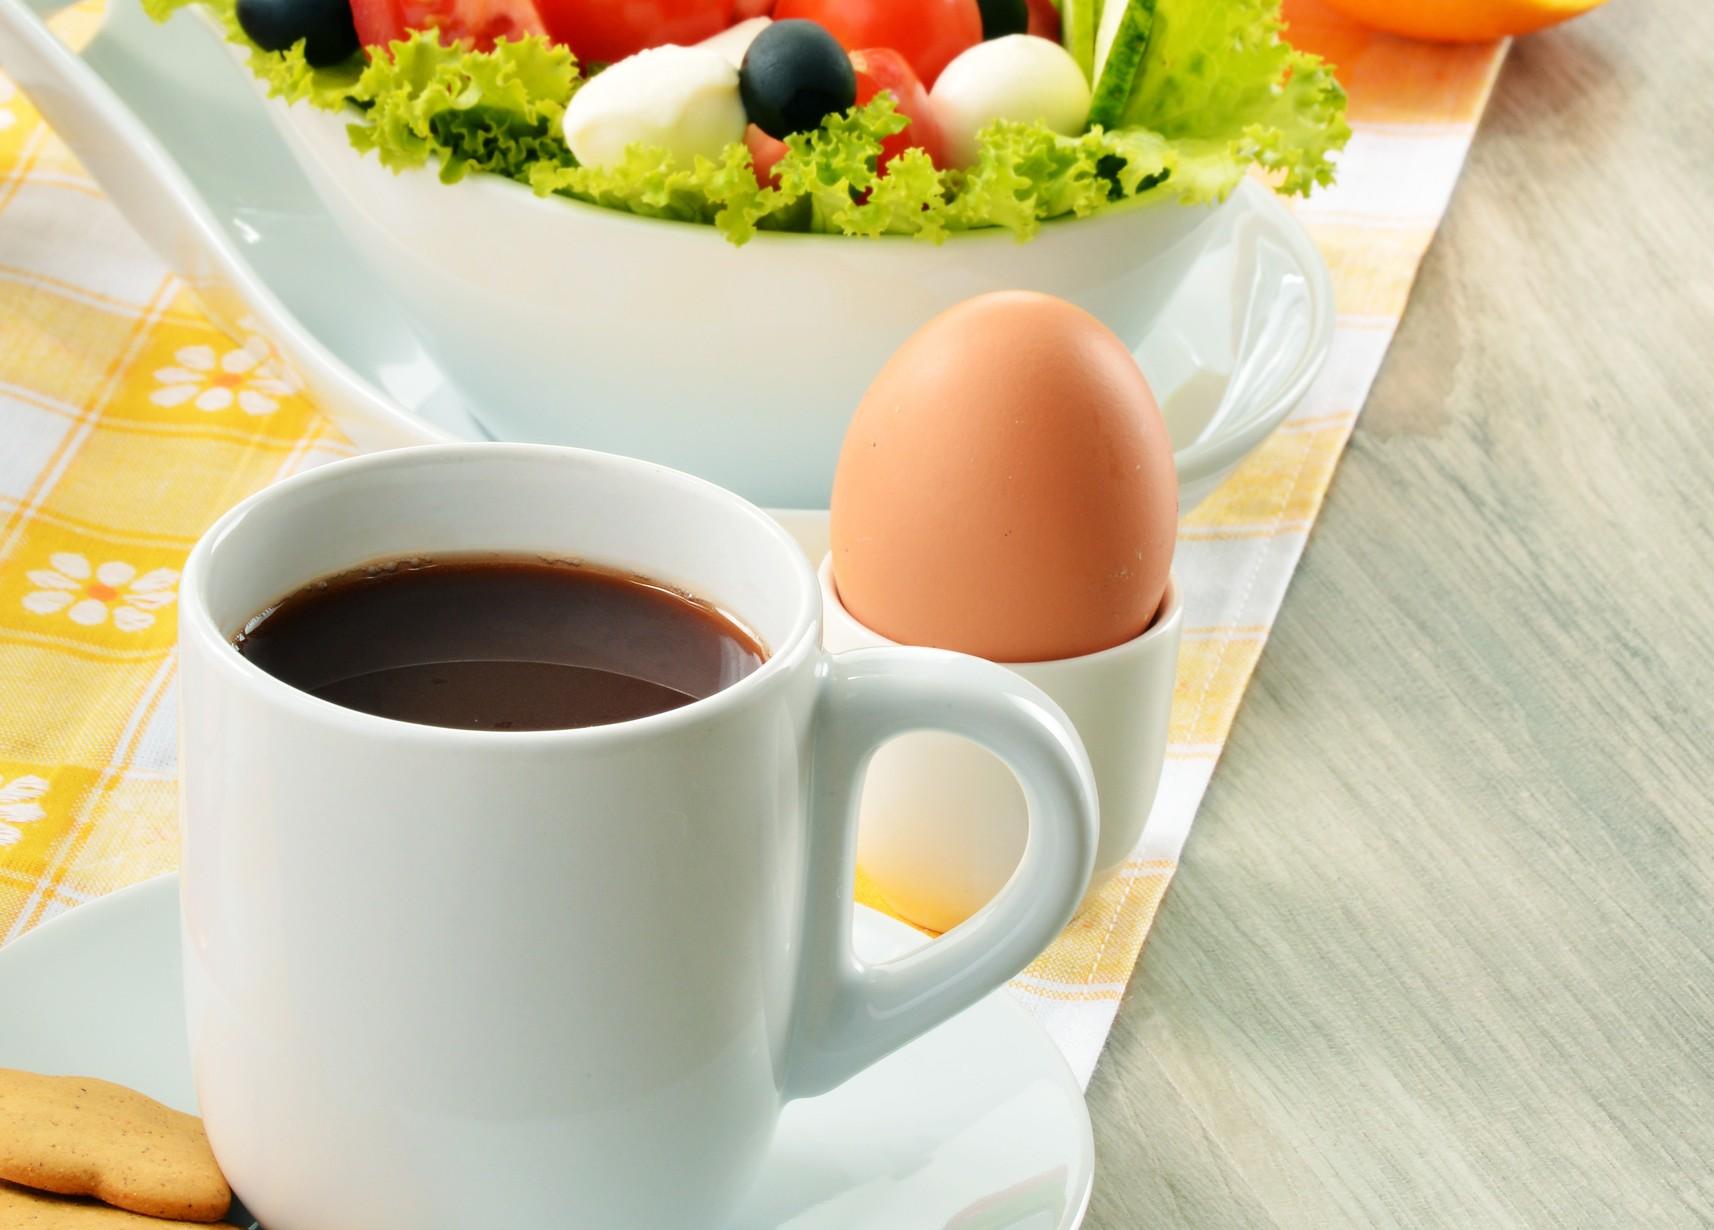 Coffee Eggs and Salad